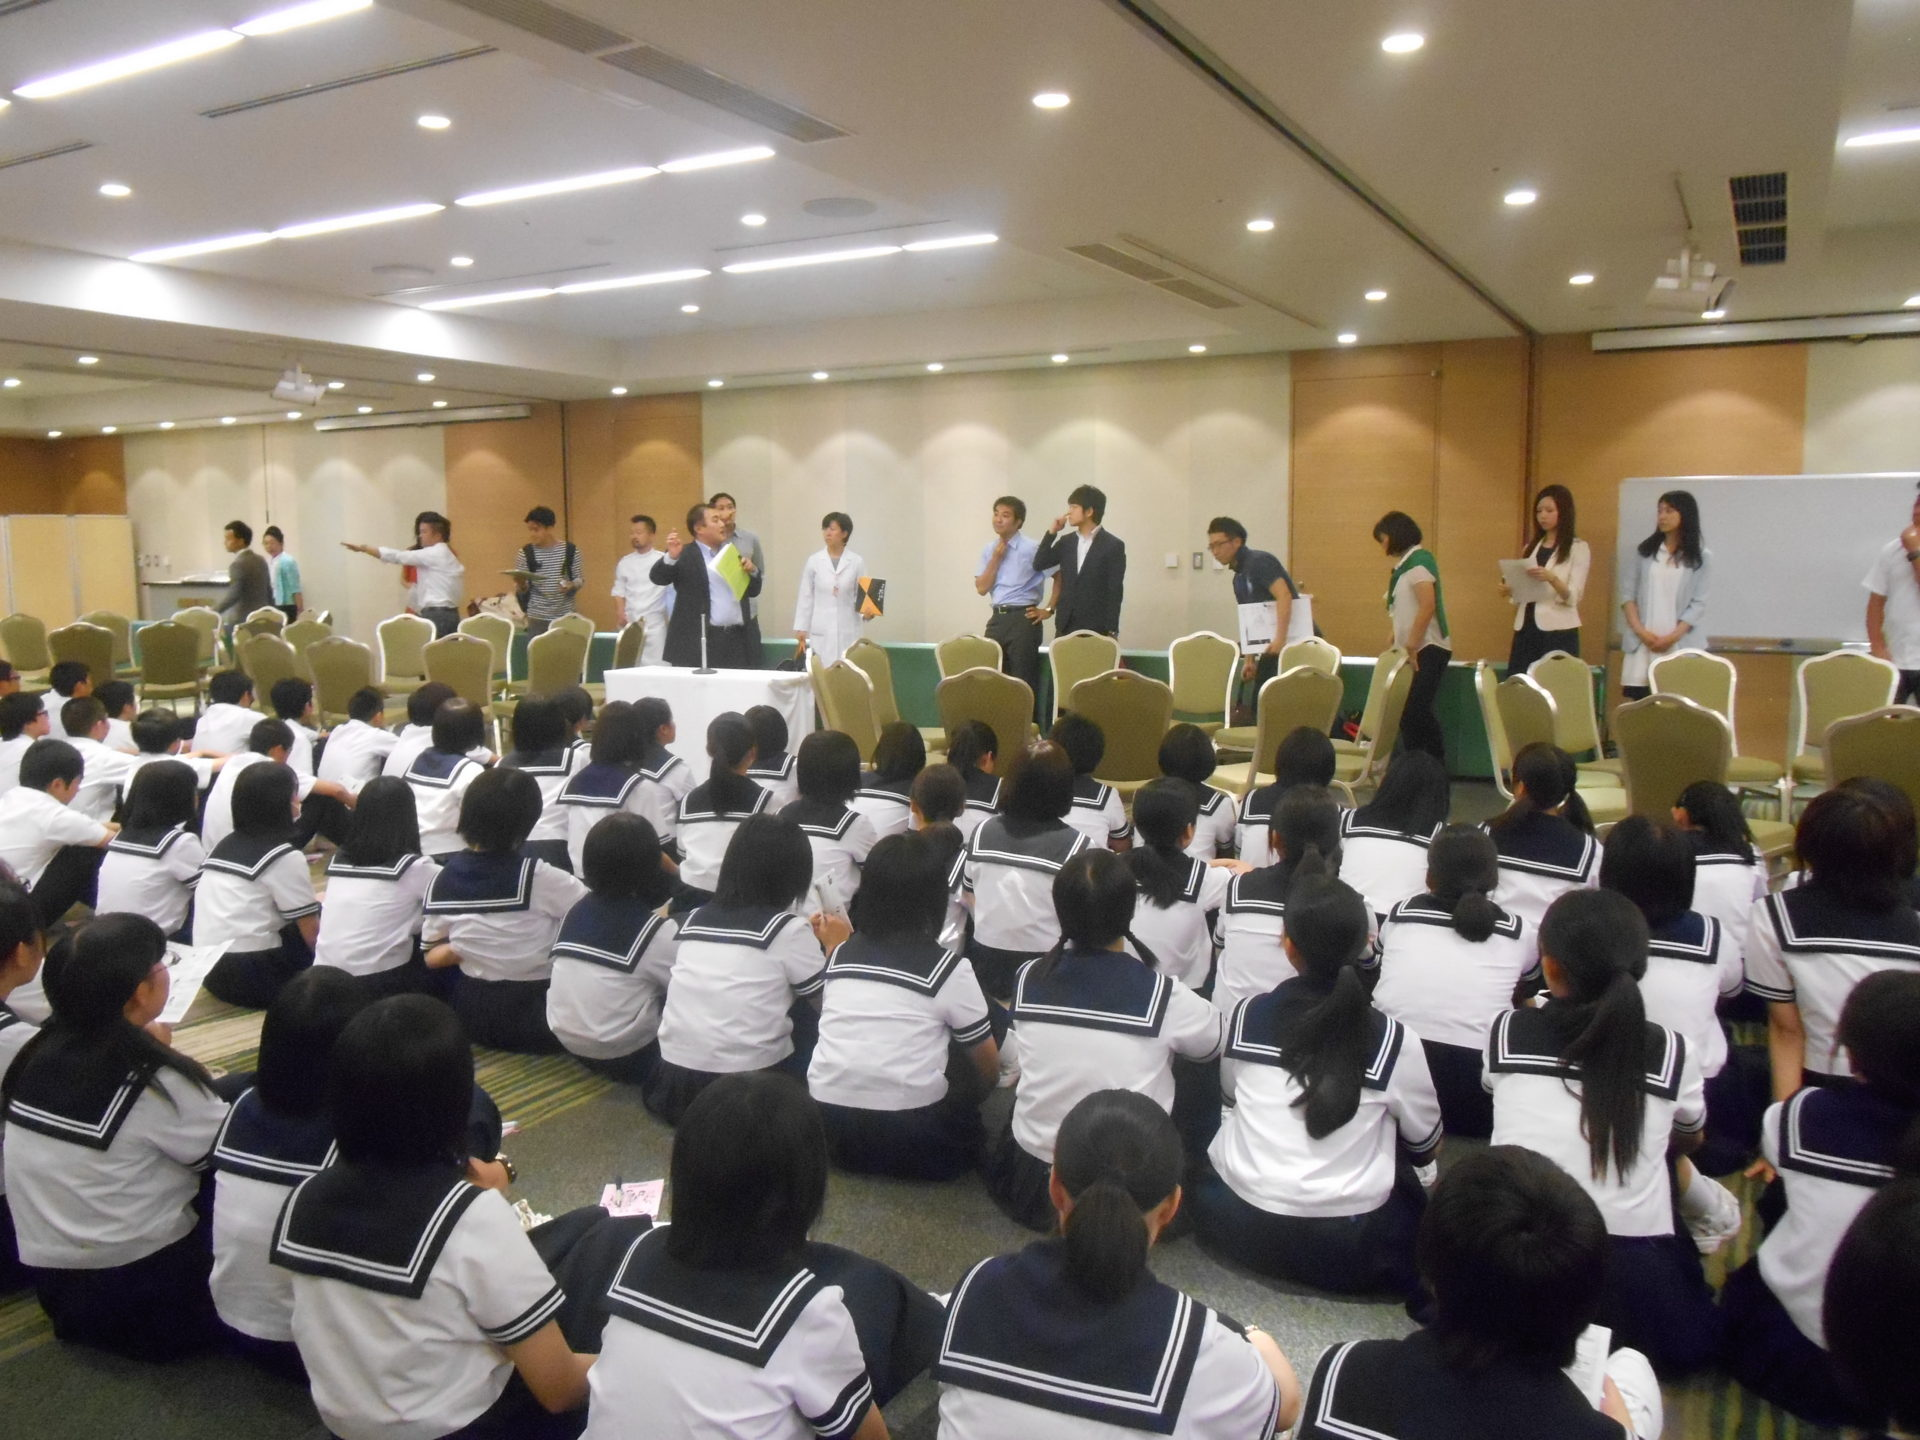 AOsukiフューチャーズゼミ 青森市西中学校